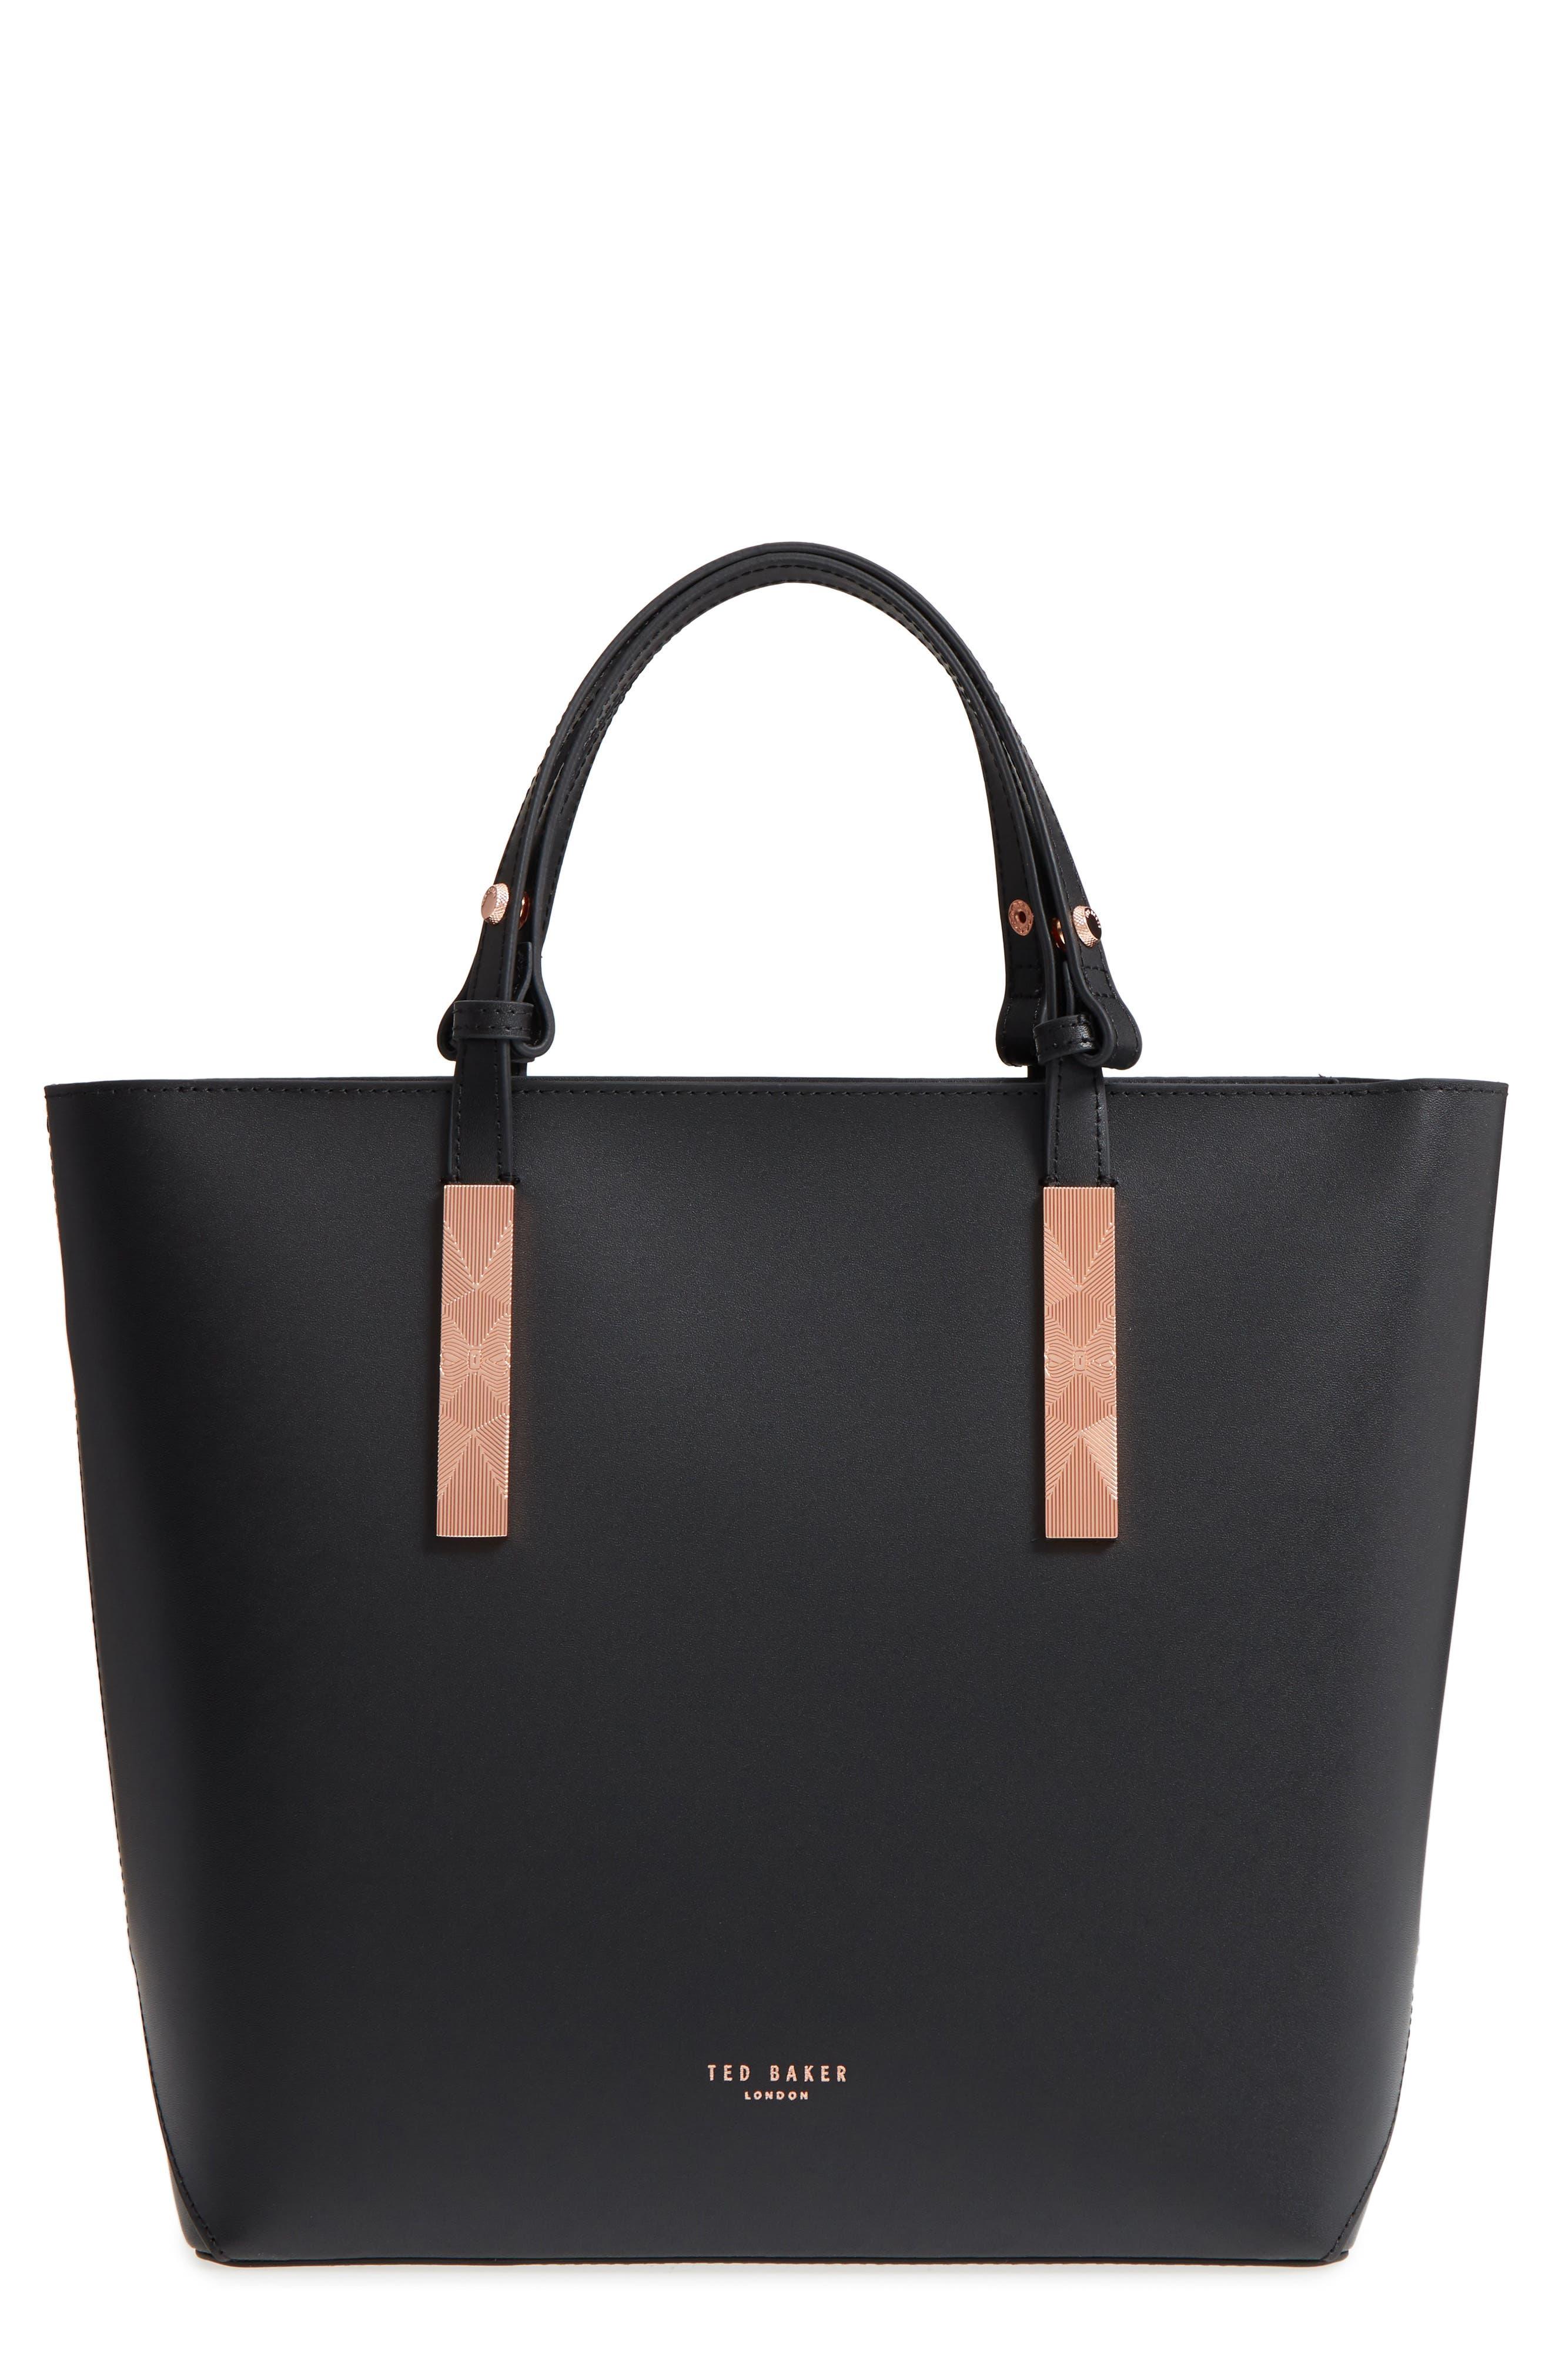 Ted Baker London Jaceyy Adjustable Handle Leather Shopper